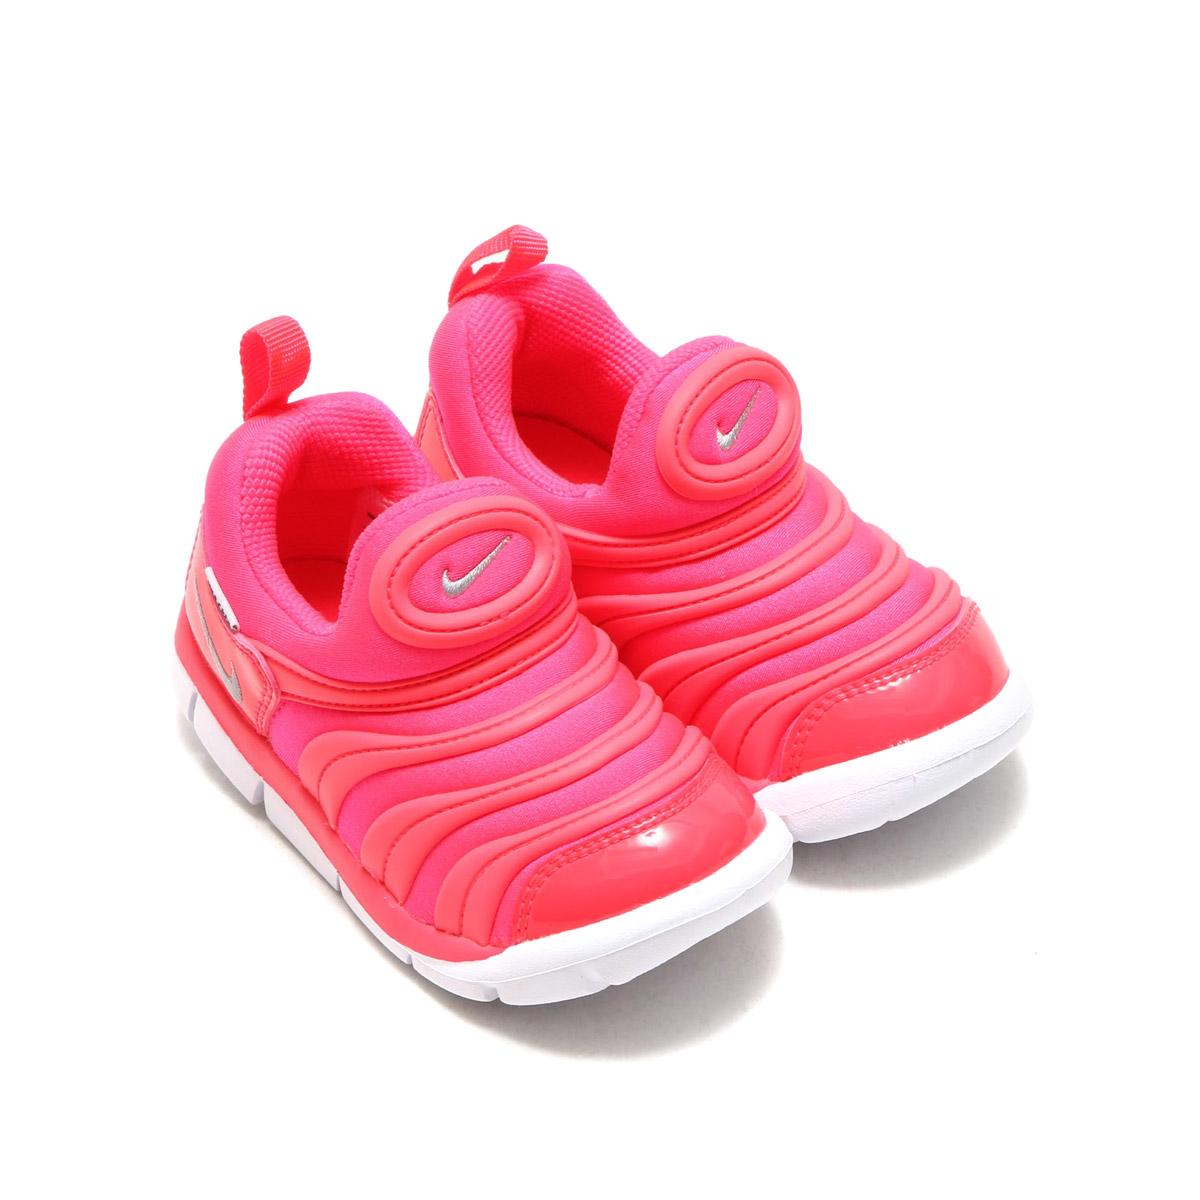 new style 83f3b 1b108 NIKE DYNAMO FREE (TD) (Nike dynamo-free TD) (RACER PINK METALLIC SILVER-HOT  PUNCH) 17SU-I